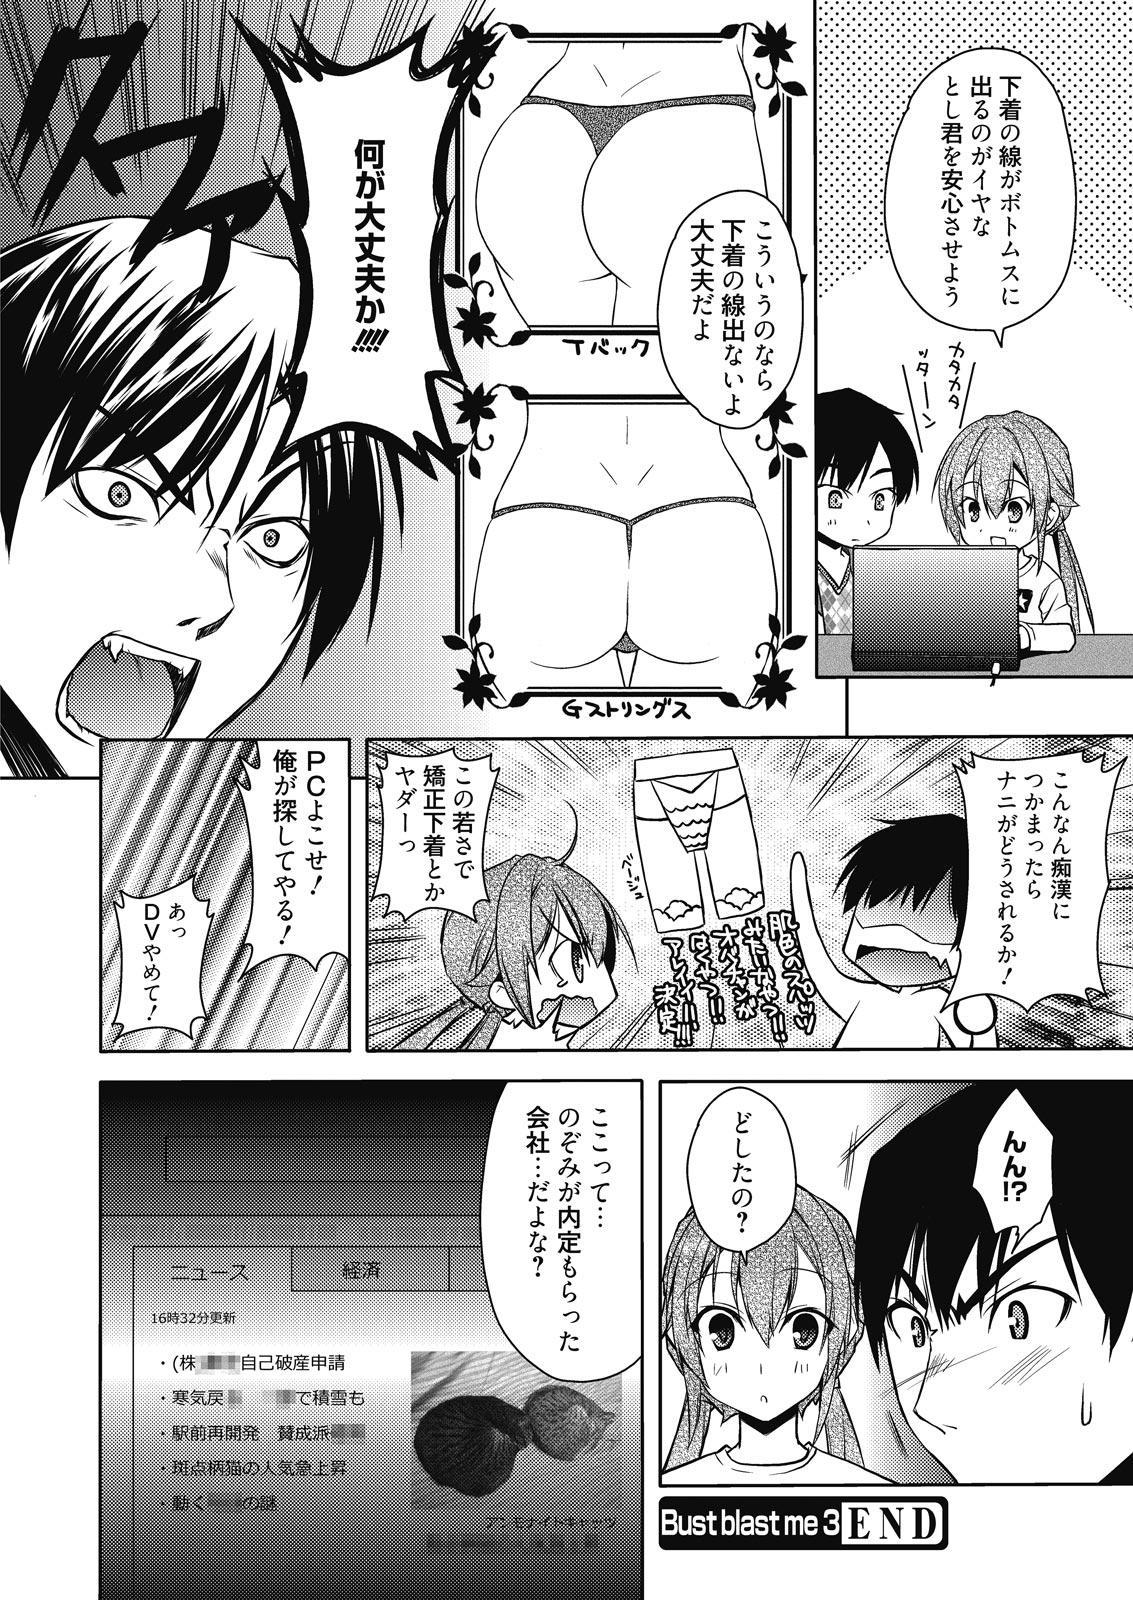 Web Manga Bangaichi Vol. 7 111